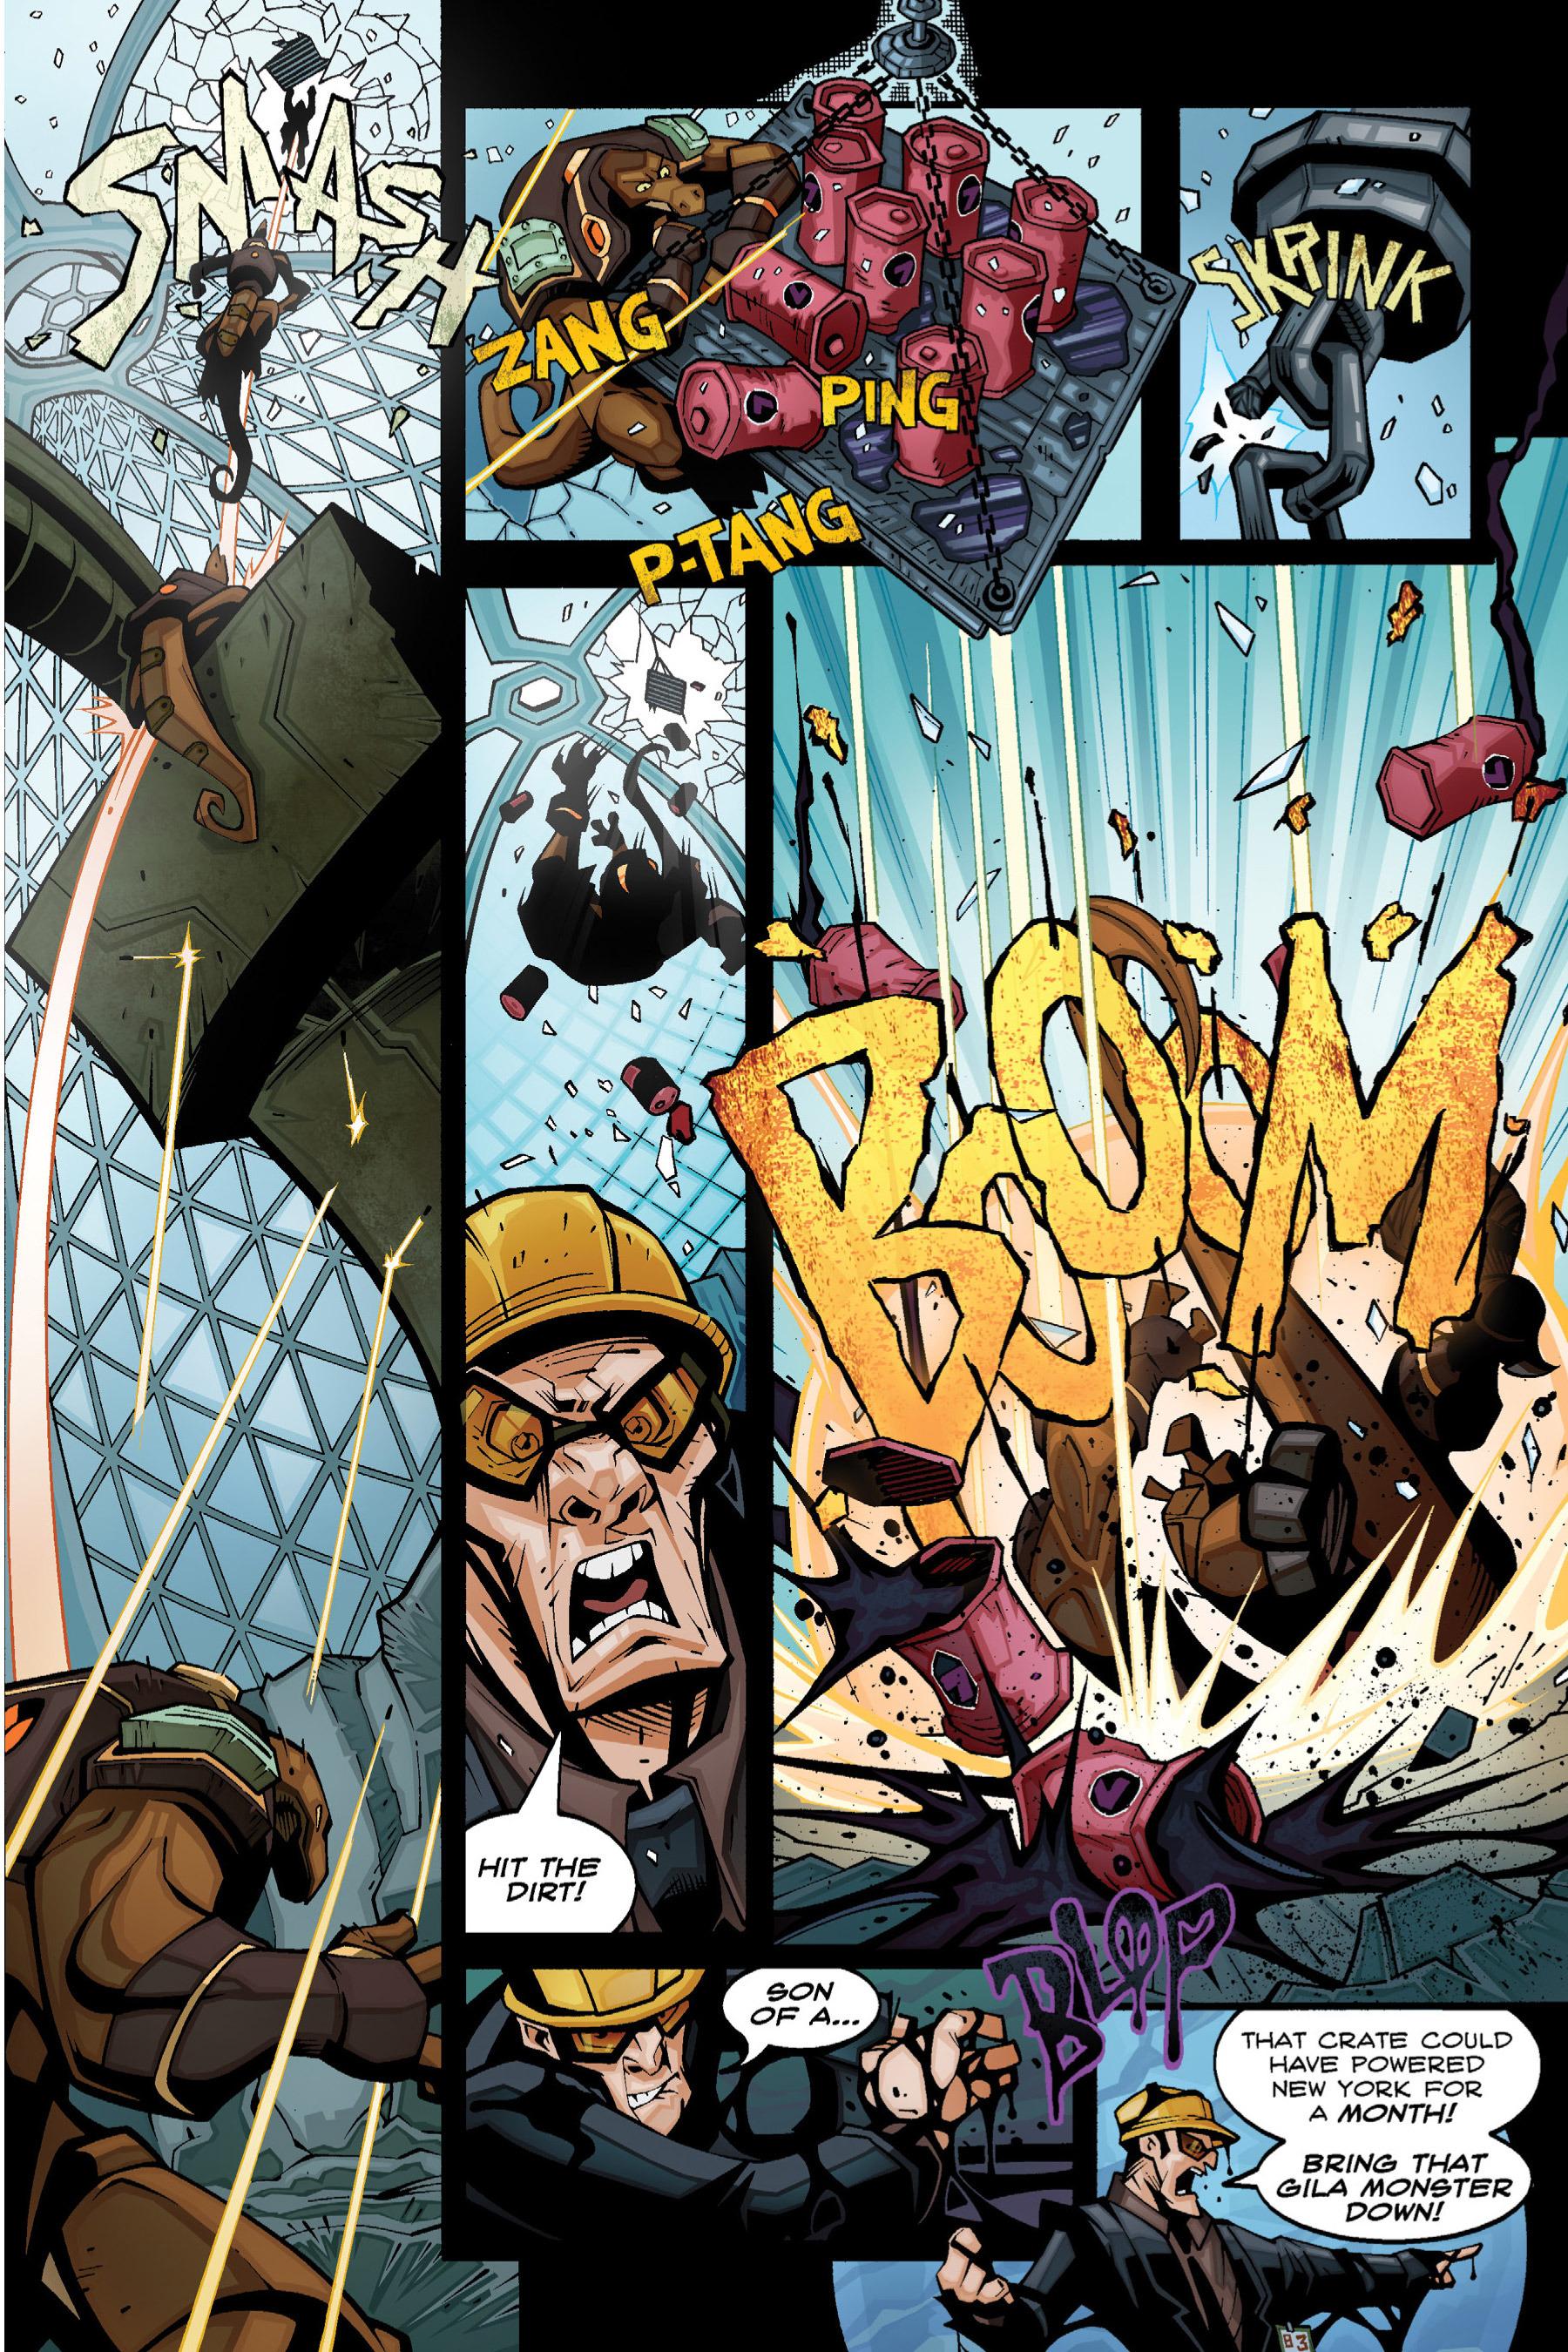 Read online Rexodus comic -  Issue # Full - 27